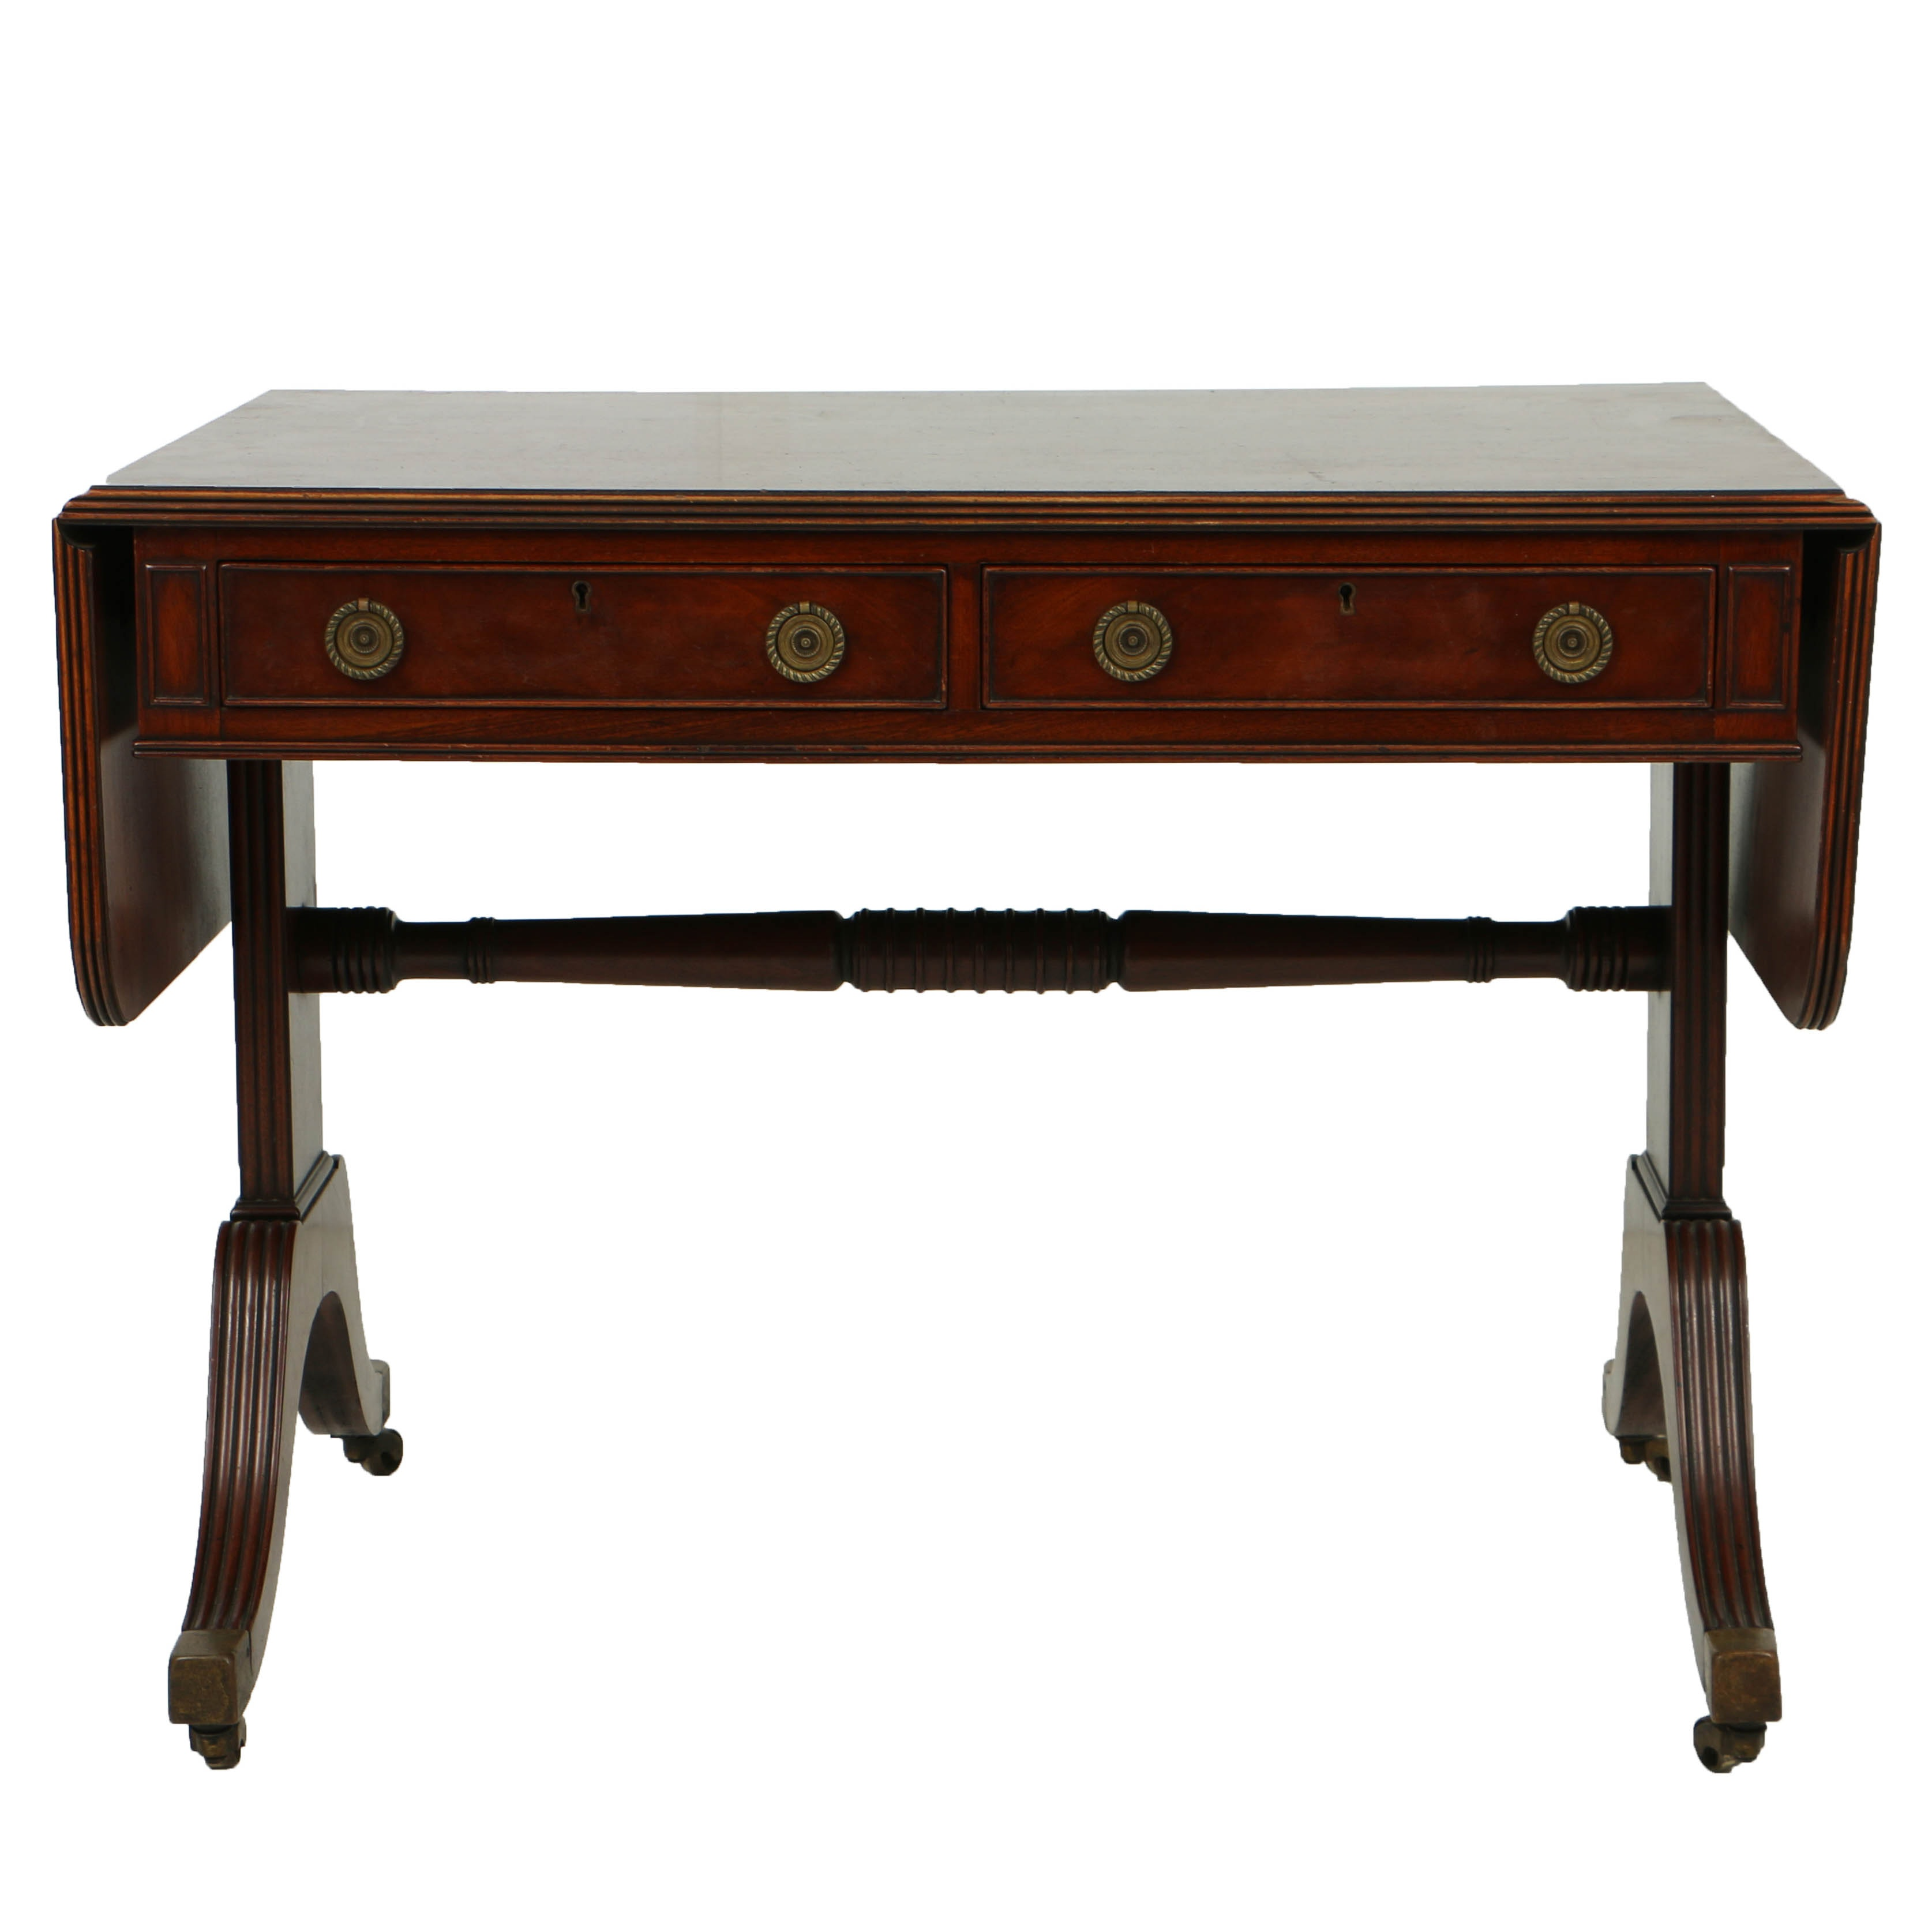 Vintage Regency Style Drop-Leaf Sofa Table in Mahogany